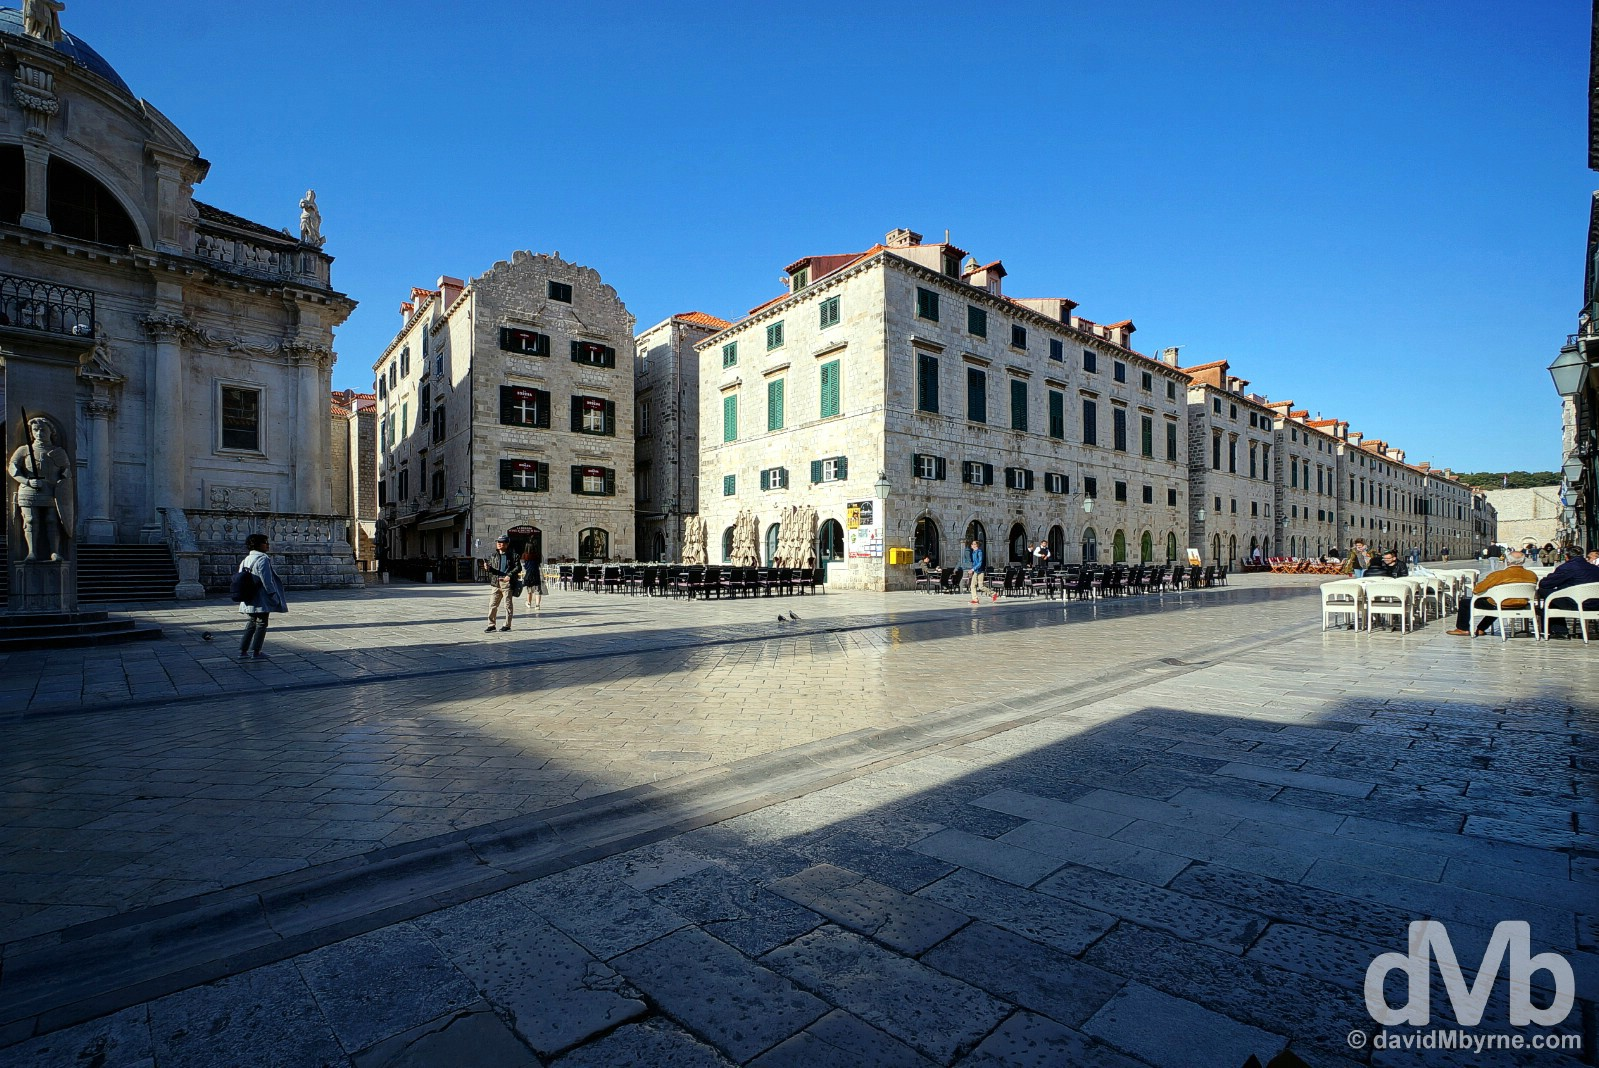 Placa, Old Town Dubrovnik, Croatia. April 8, 2015.